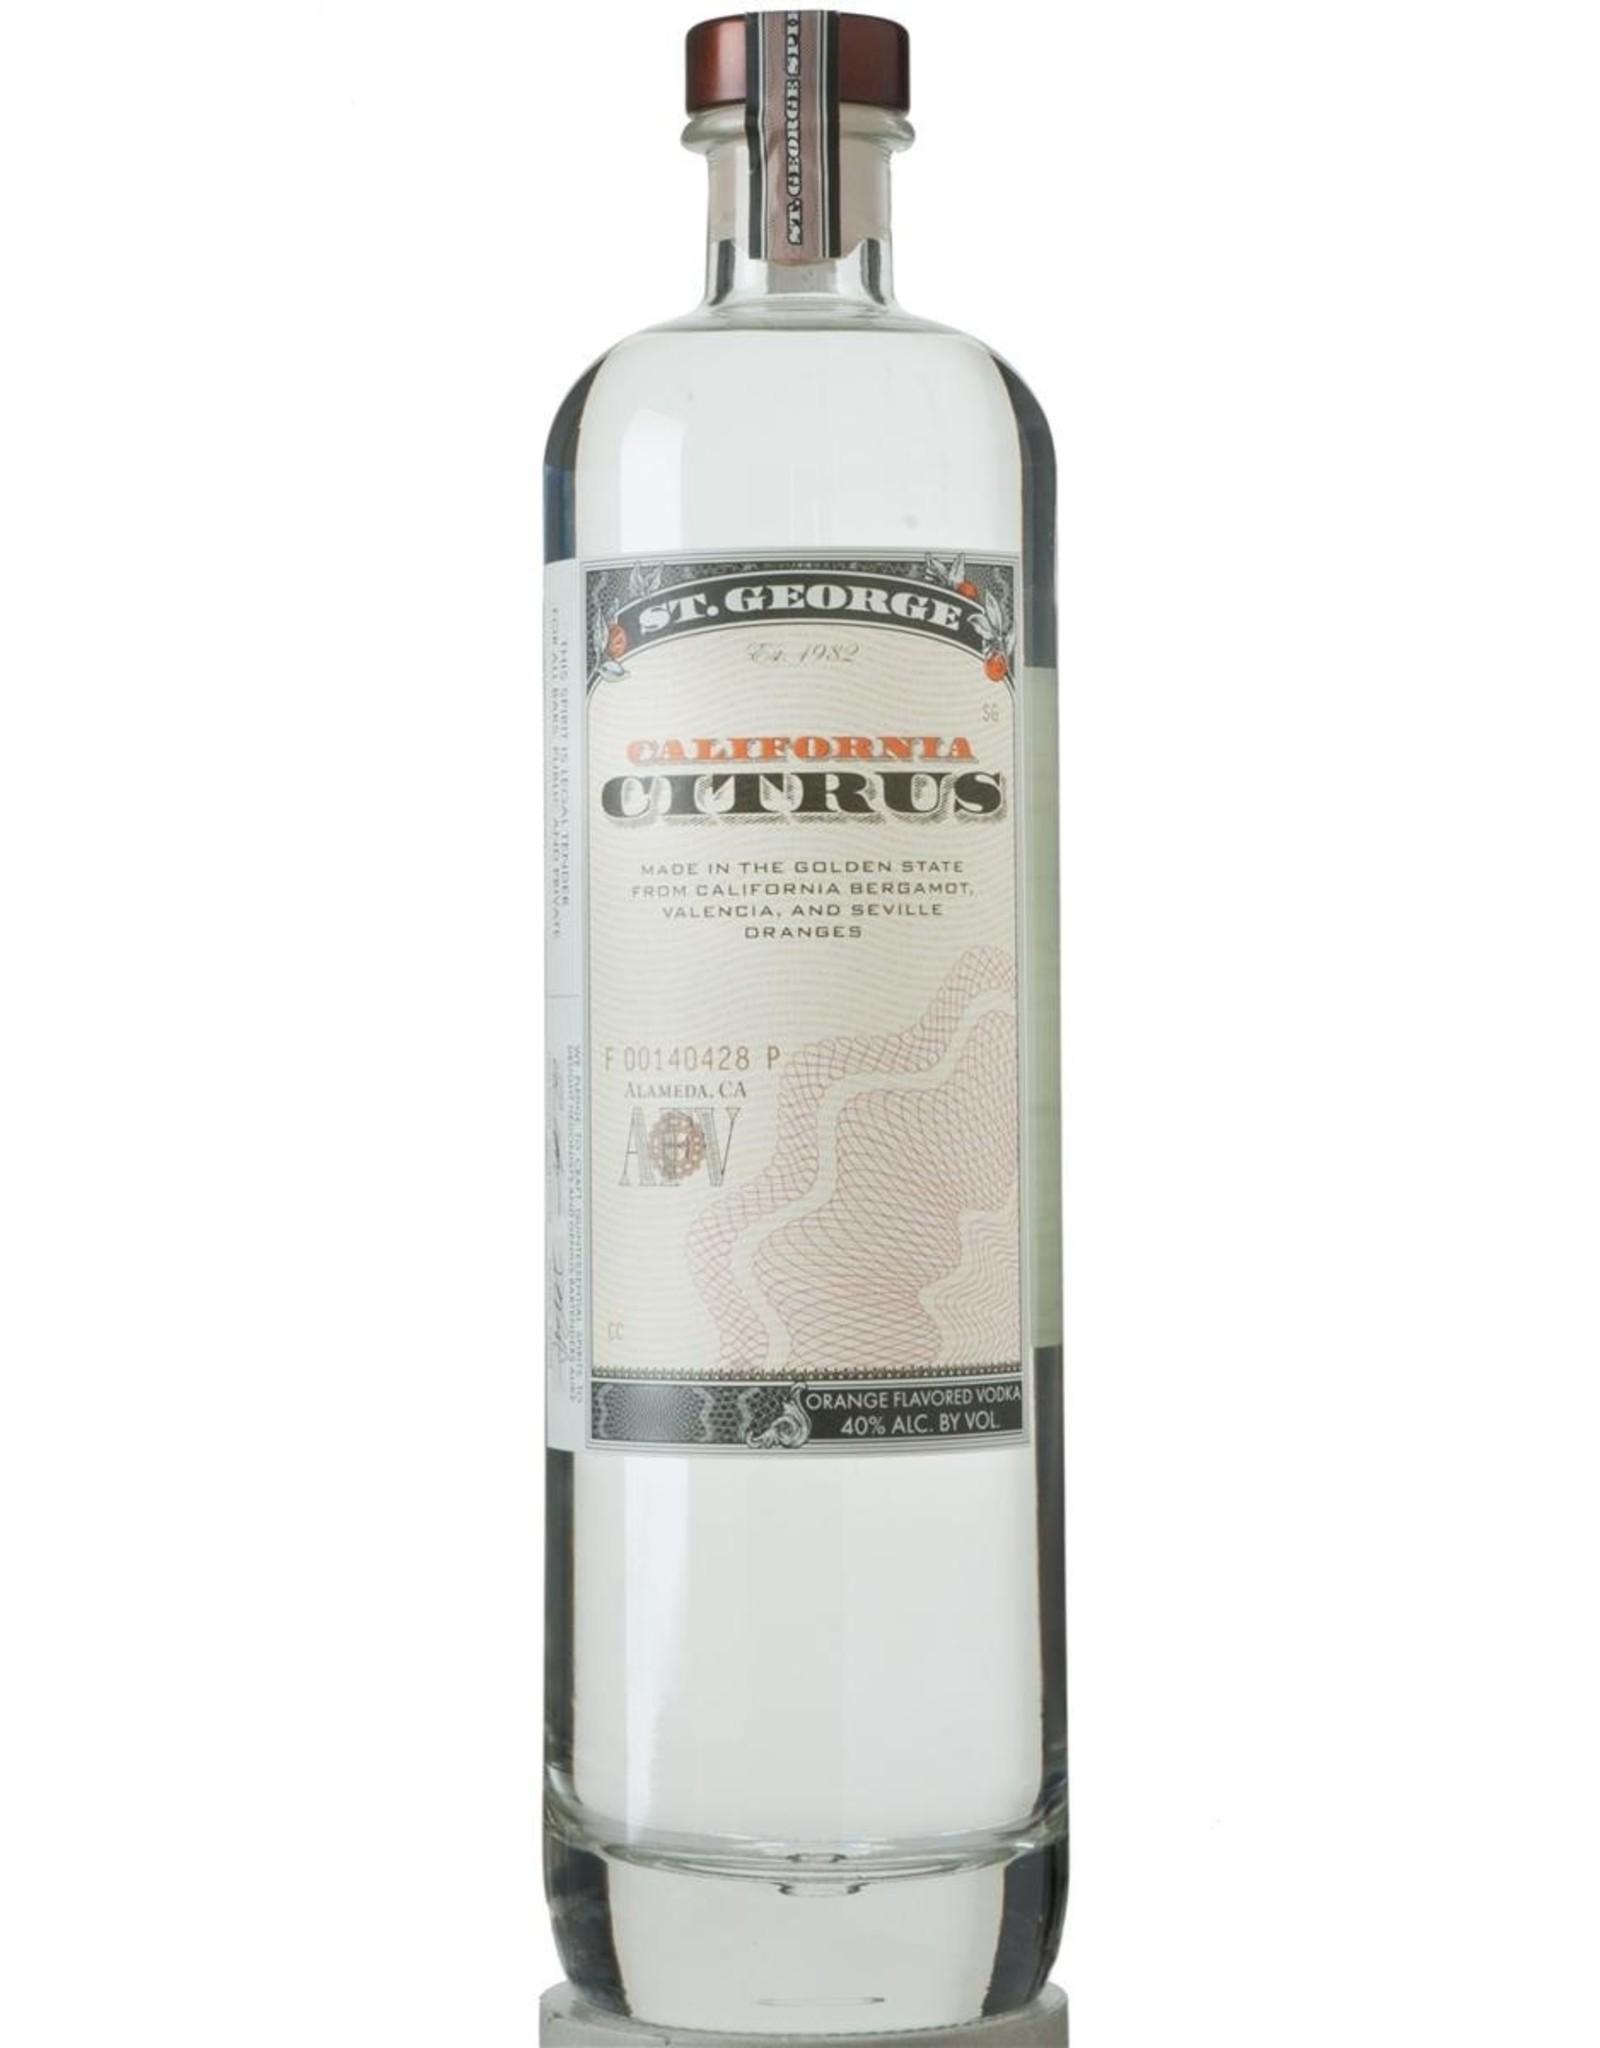 St. George Citrus Vodka